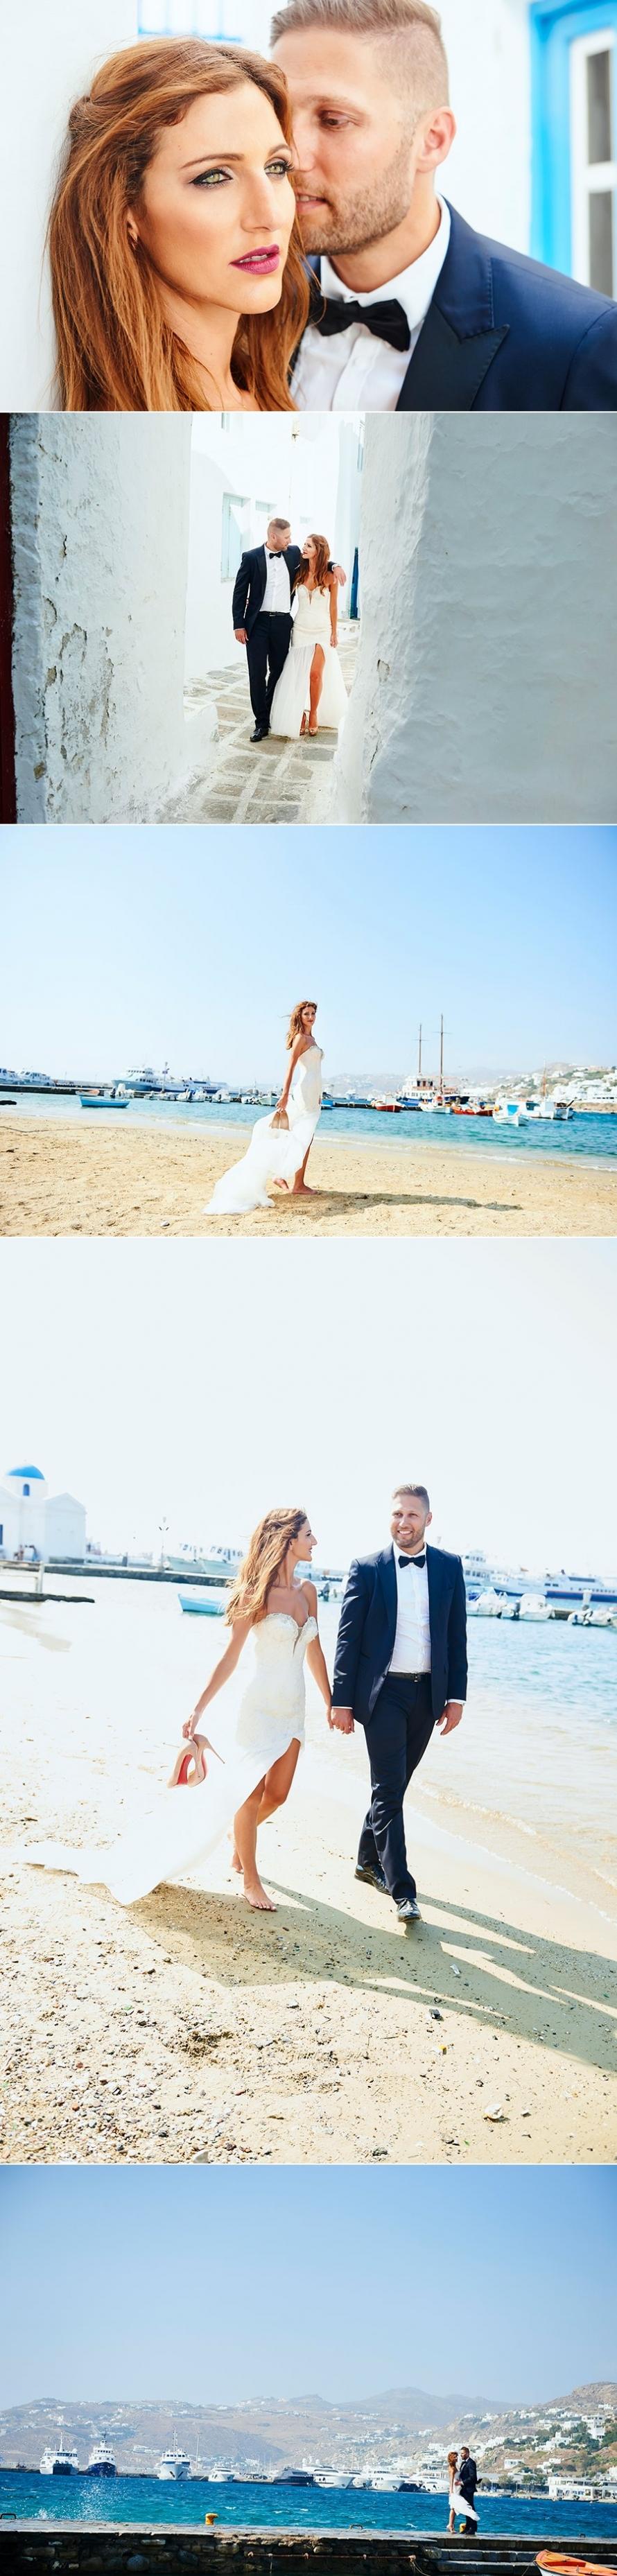 Gragan Gloria wedding photo 05